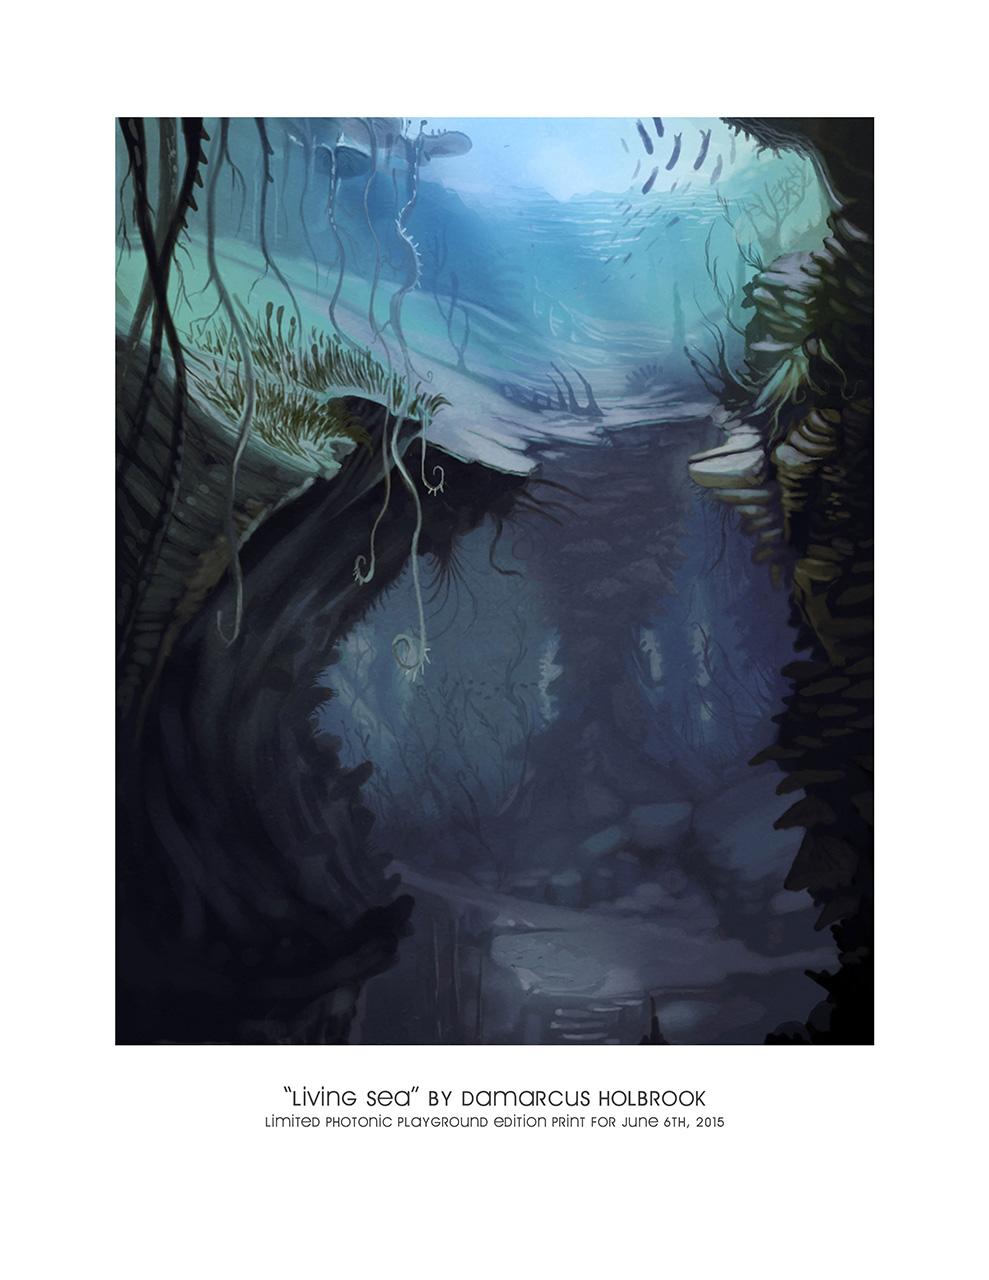 Living Sea (print)